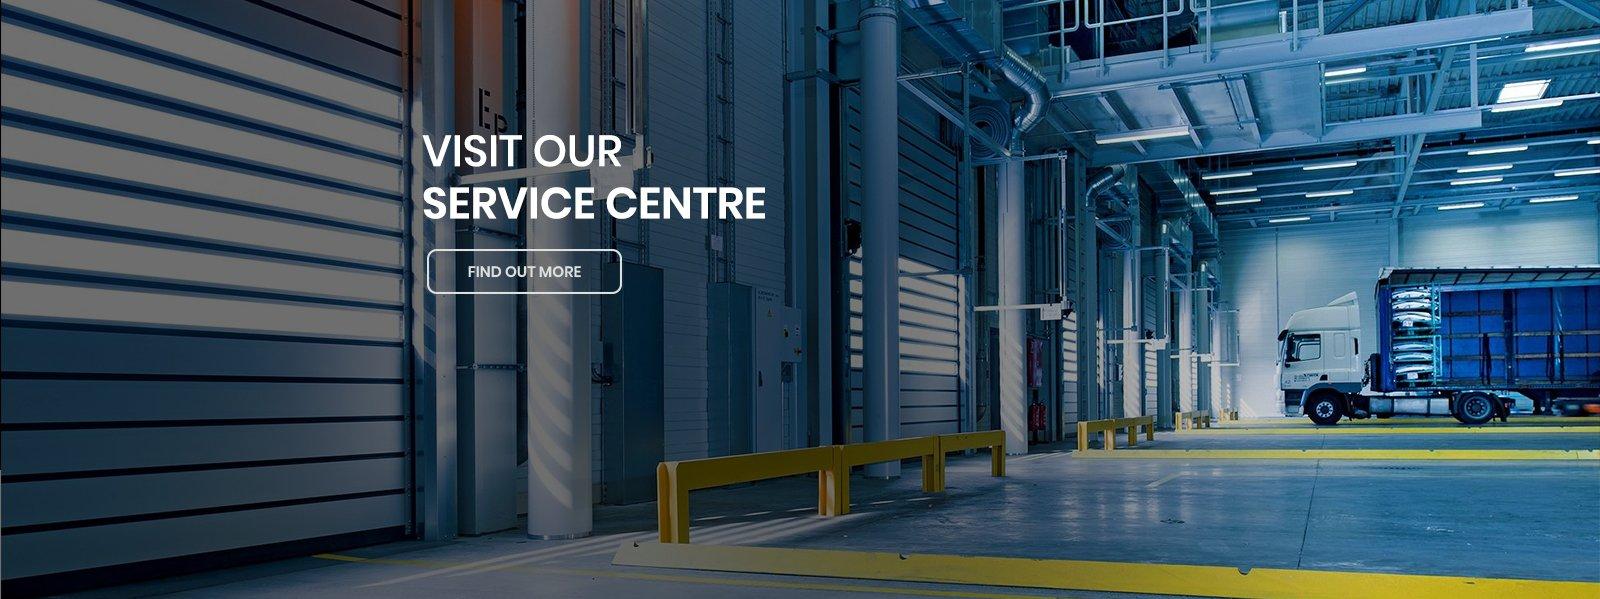 BOOK A SERVICE | Email service@dtsunshinecoast.com.au or call  5452 0700